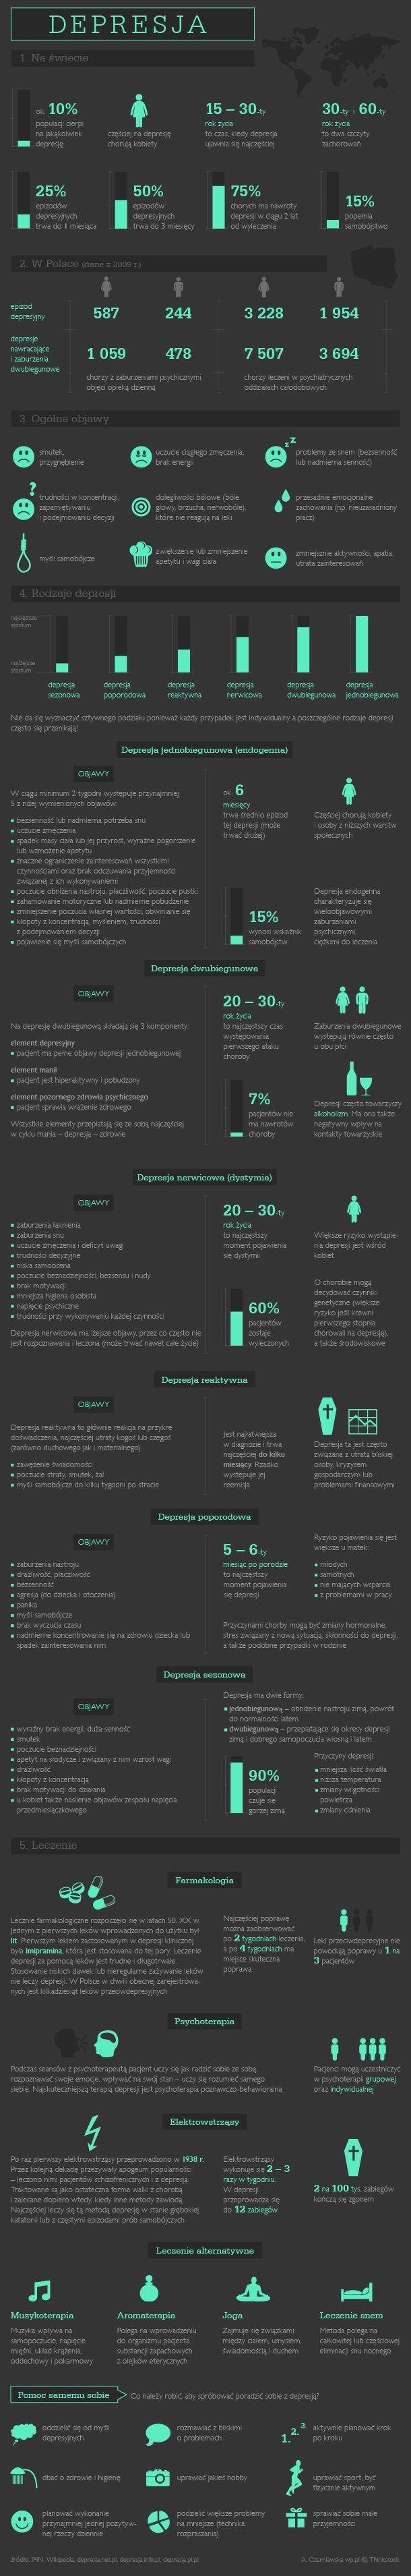 depresja_infografika_610.jpeg (610×3819)